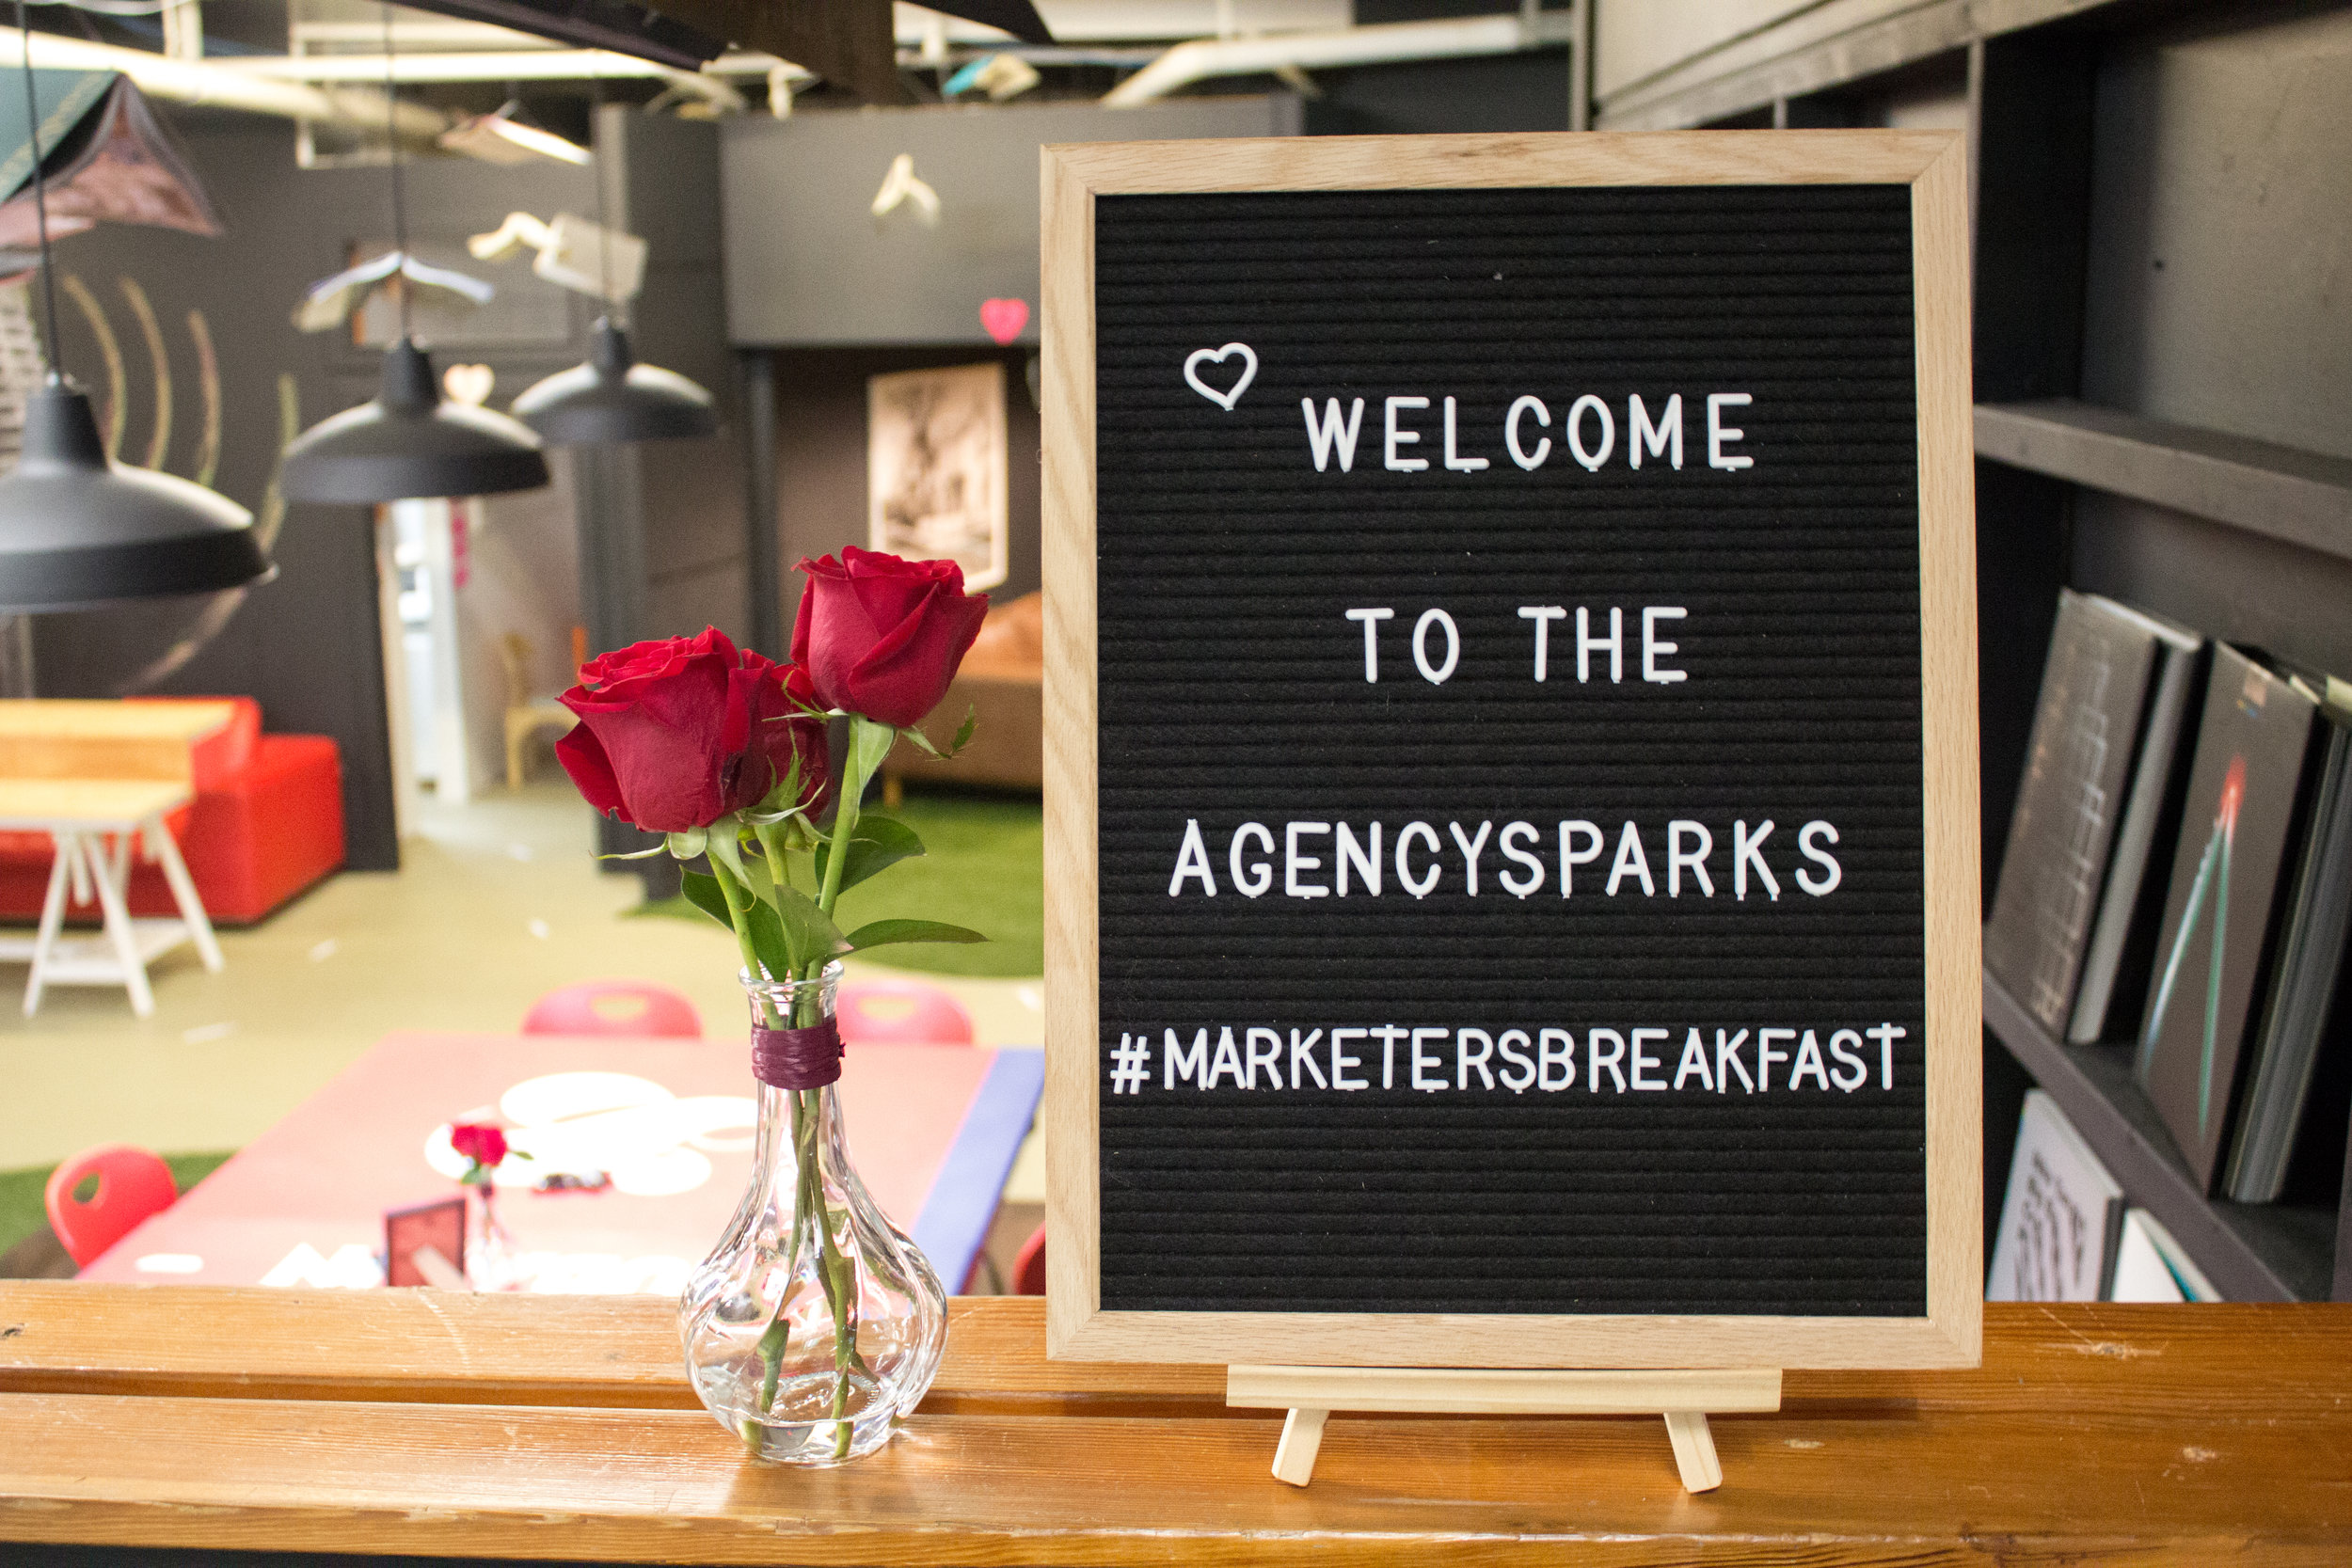 AgencySparks_Feb 2019 MB-9270.jpg